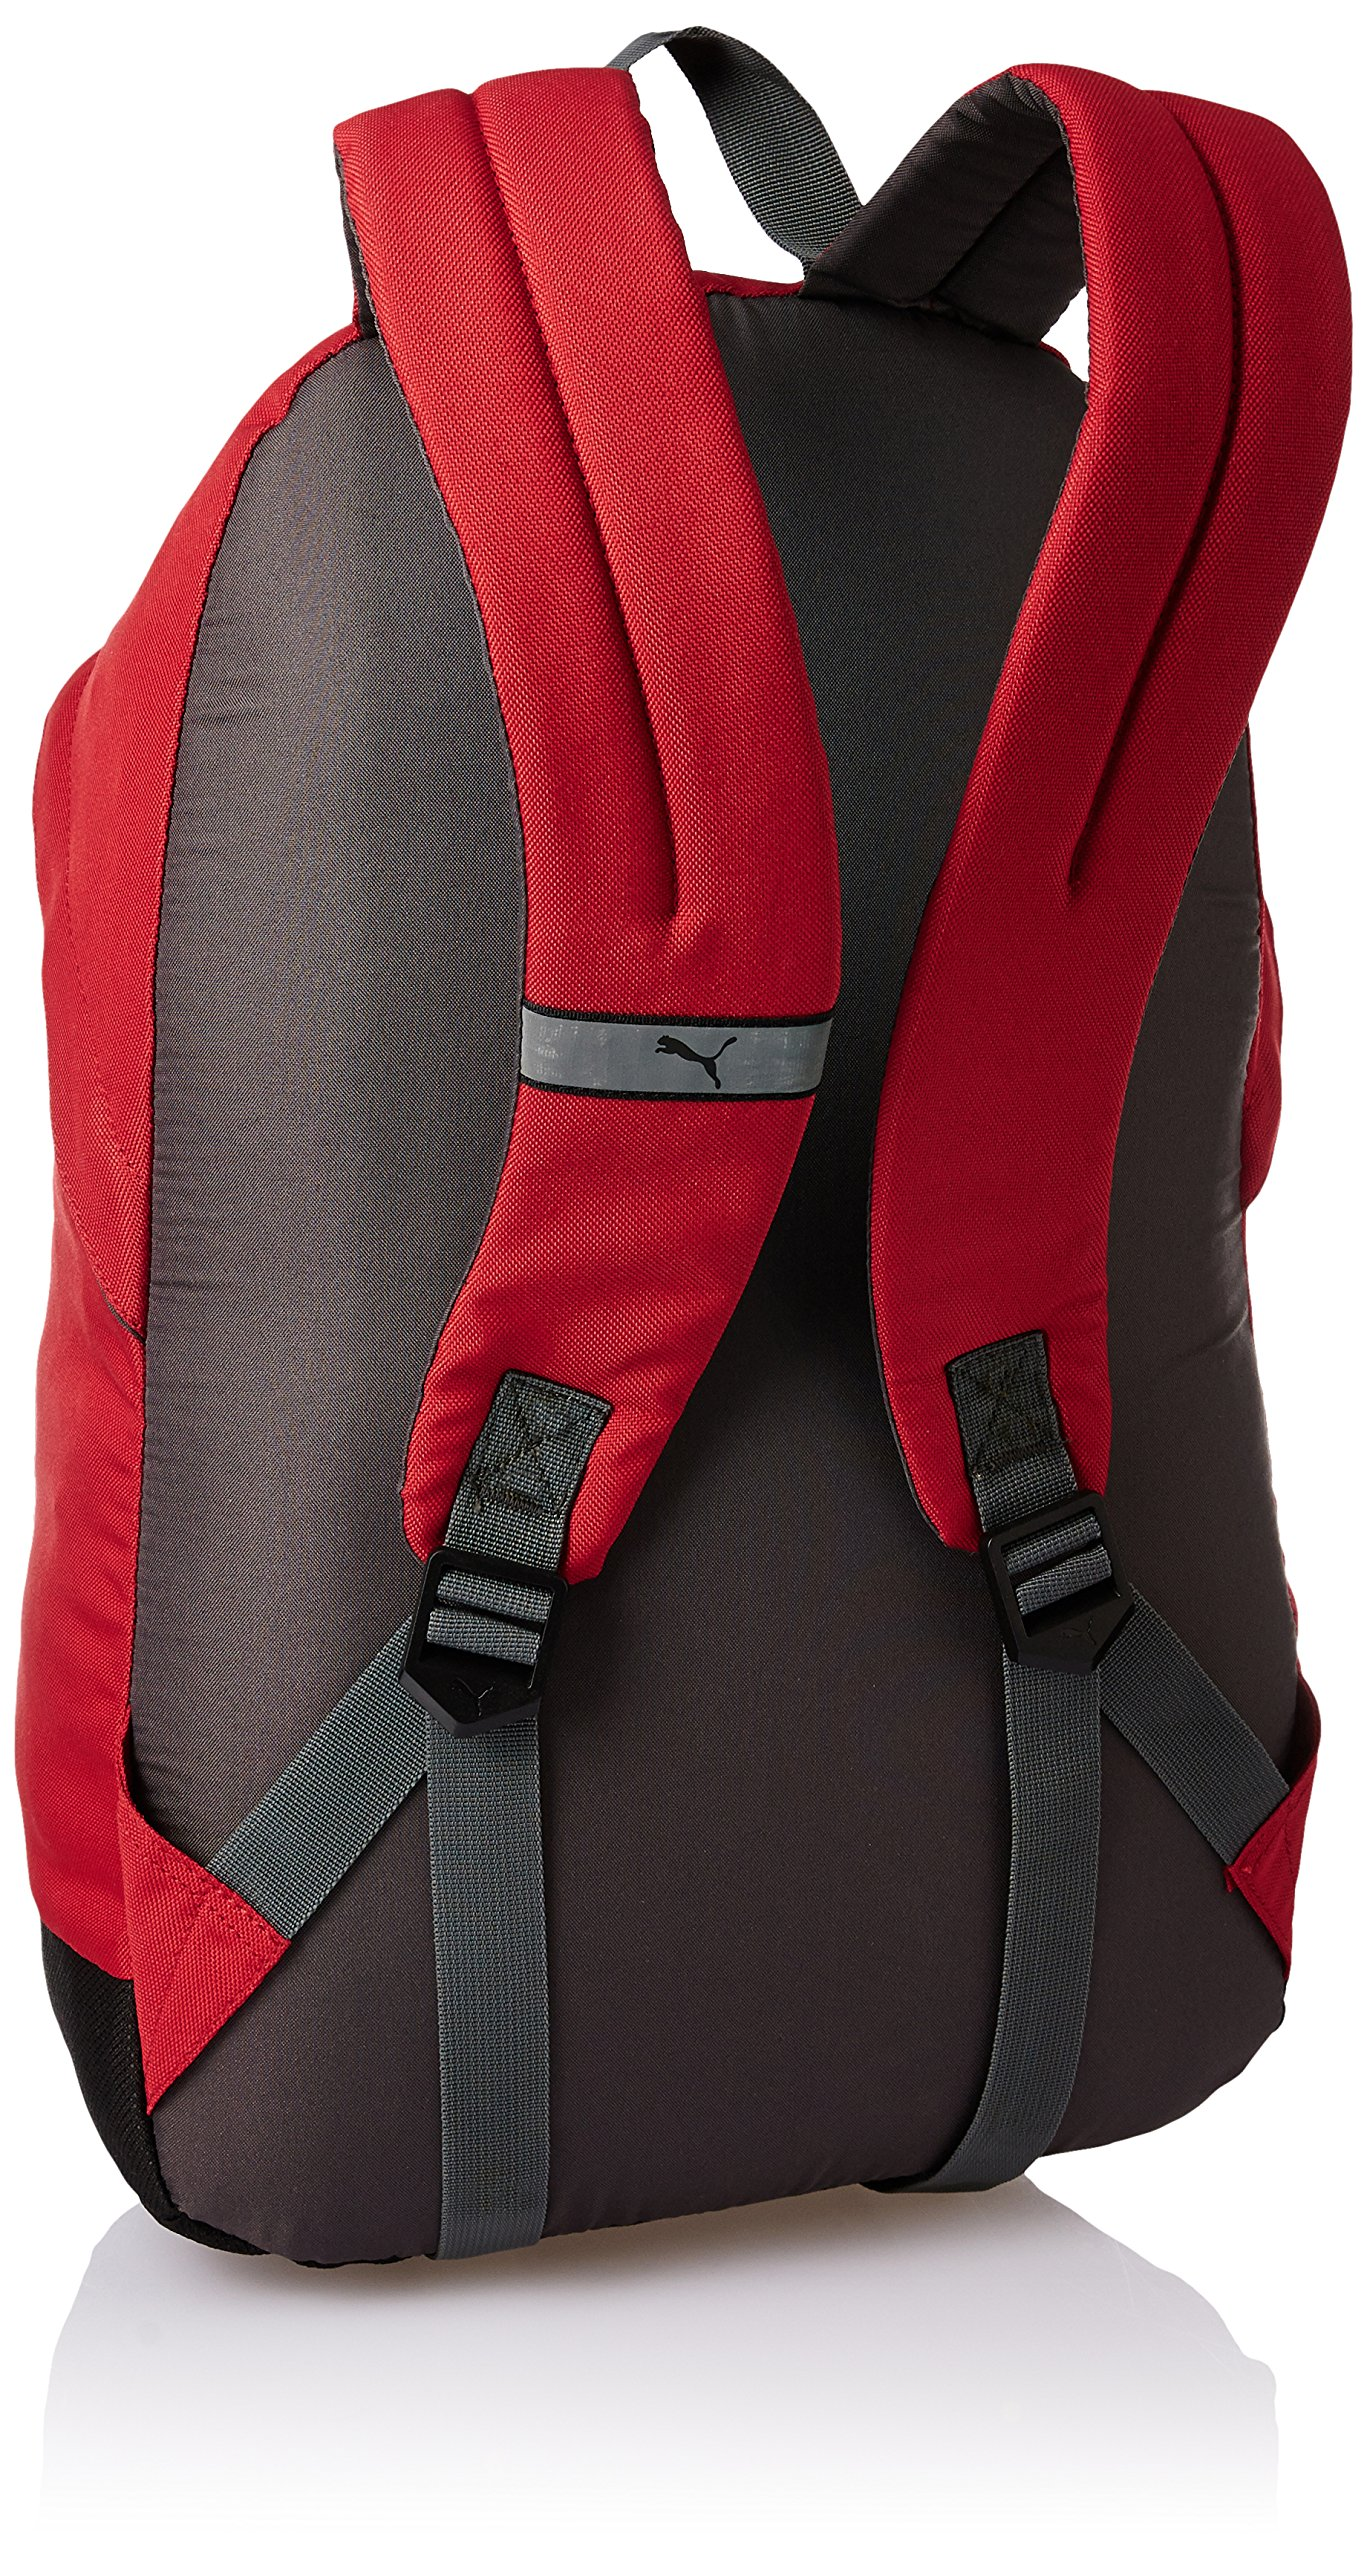 91tJvTLTWAL - Puma Pioneer Backpack II-Mochila